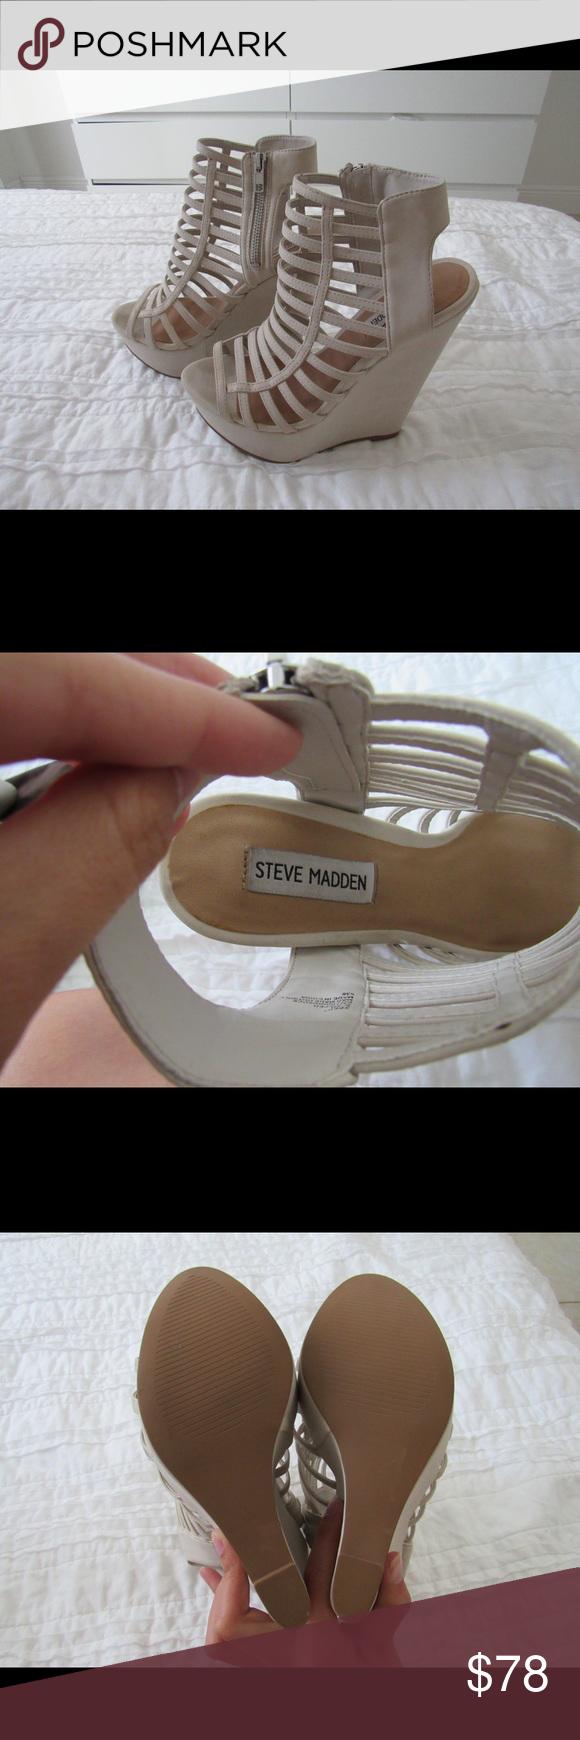 Steve Madden Wedges Steve Madden bone white wedges in size 8 1/2. True in size and never worn! Steve Madden Shoes Wedges